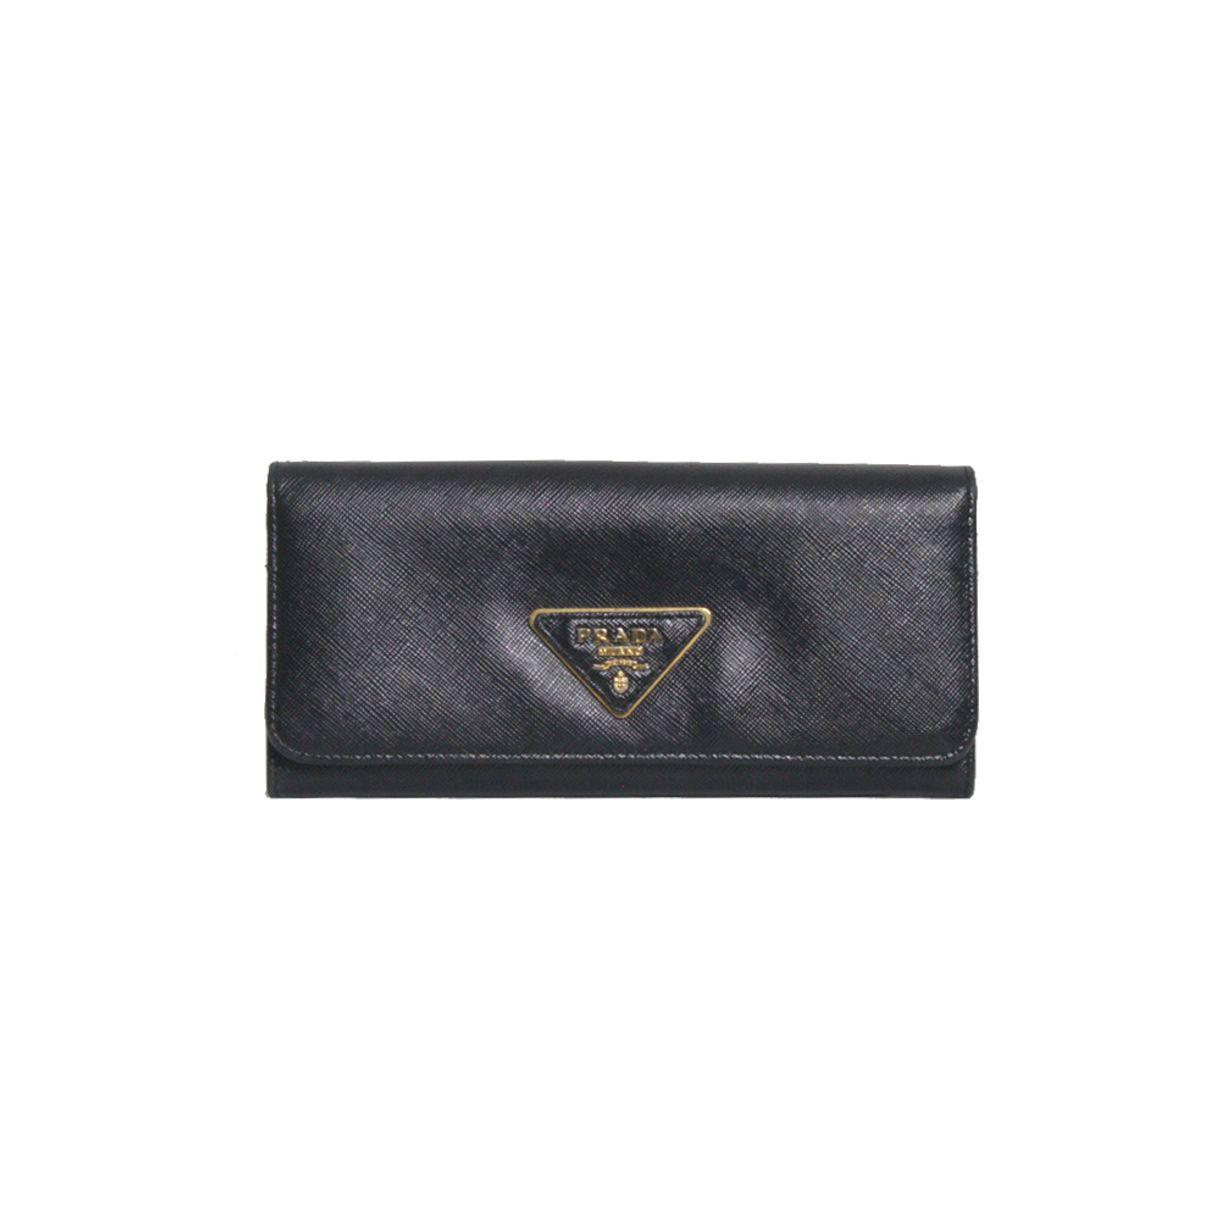 Carteira-Prada-Zaffiano-Leather-Preta